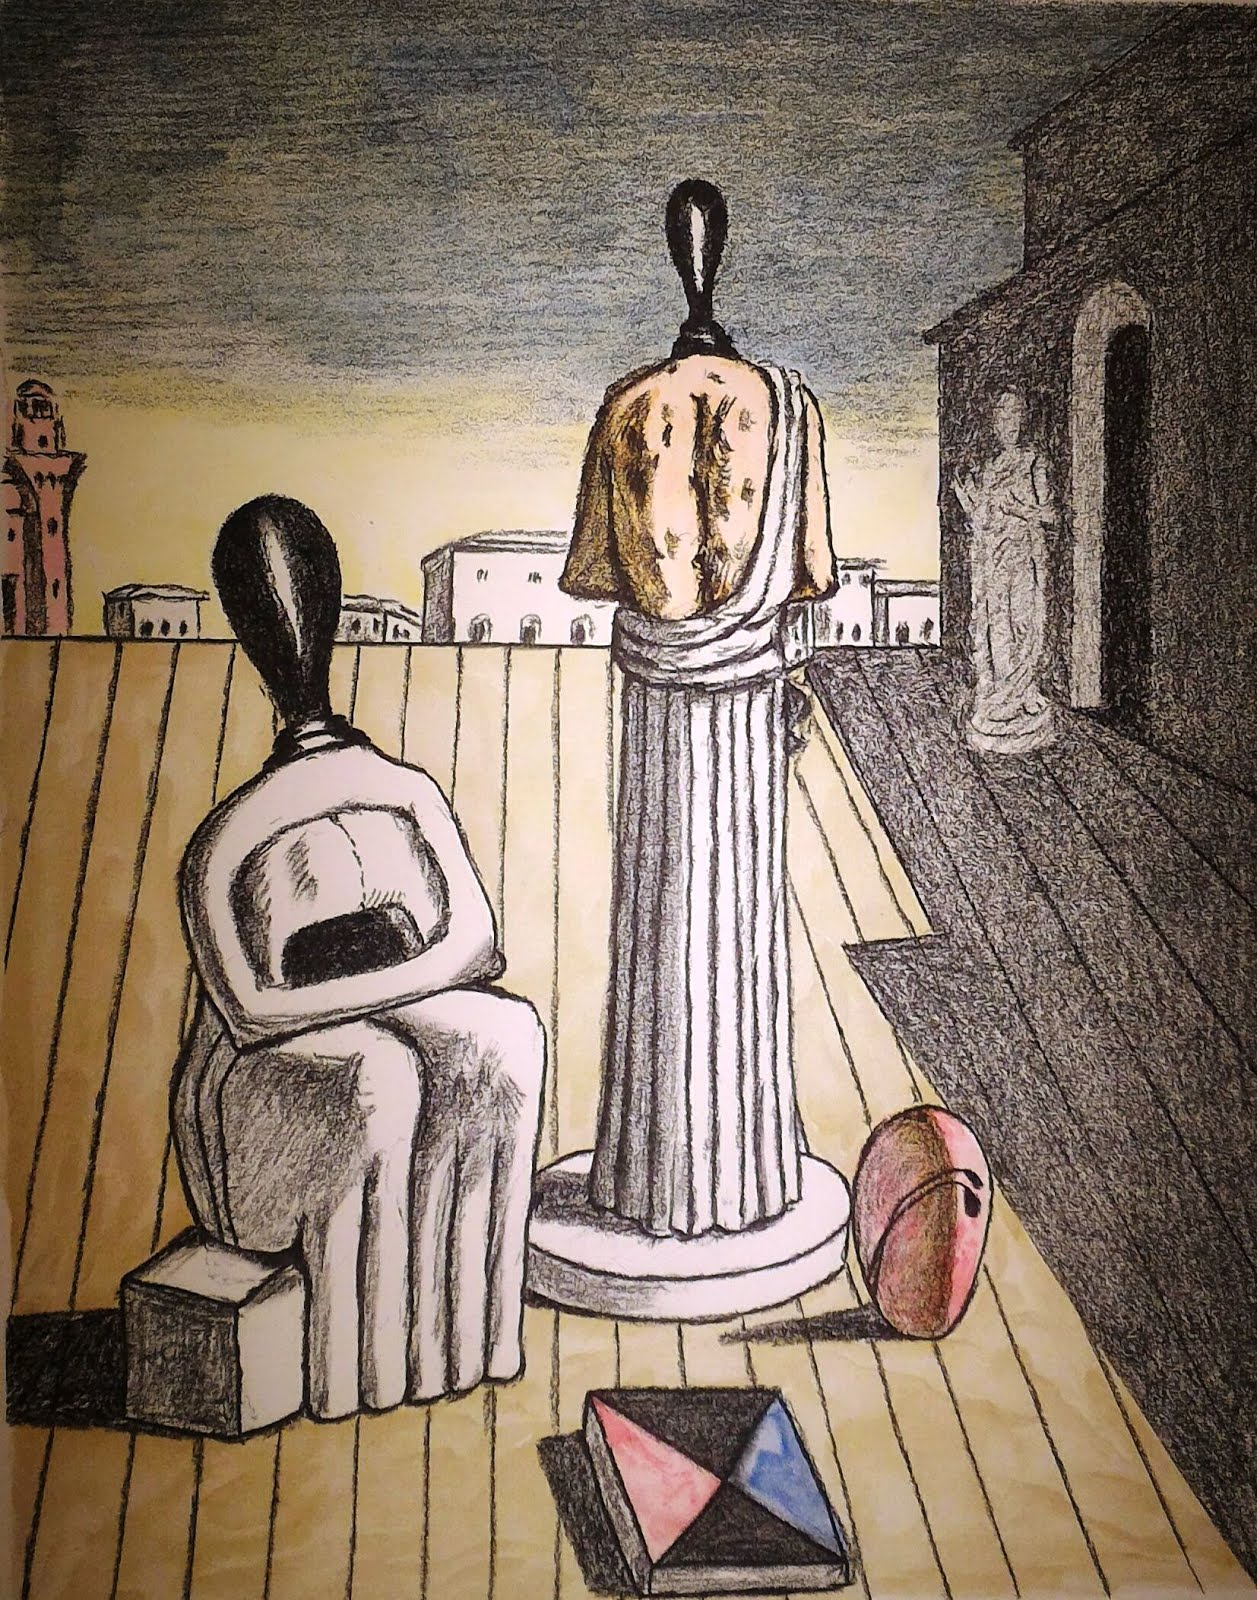 giorgio de chirico, tra metafisica e cultura classica